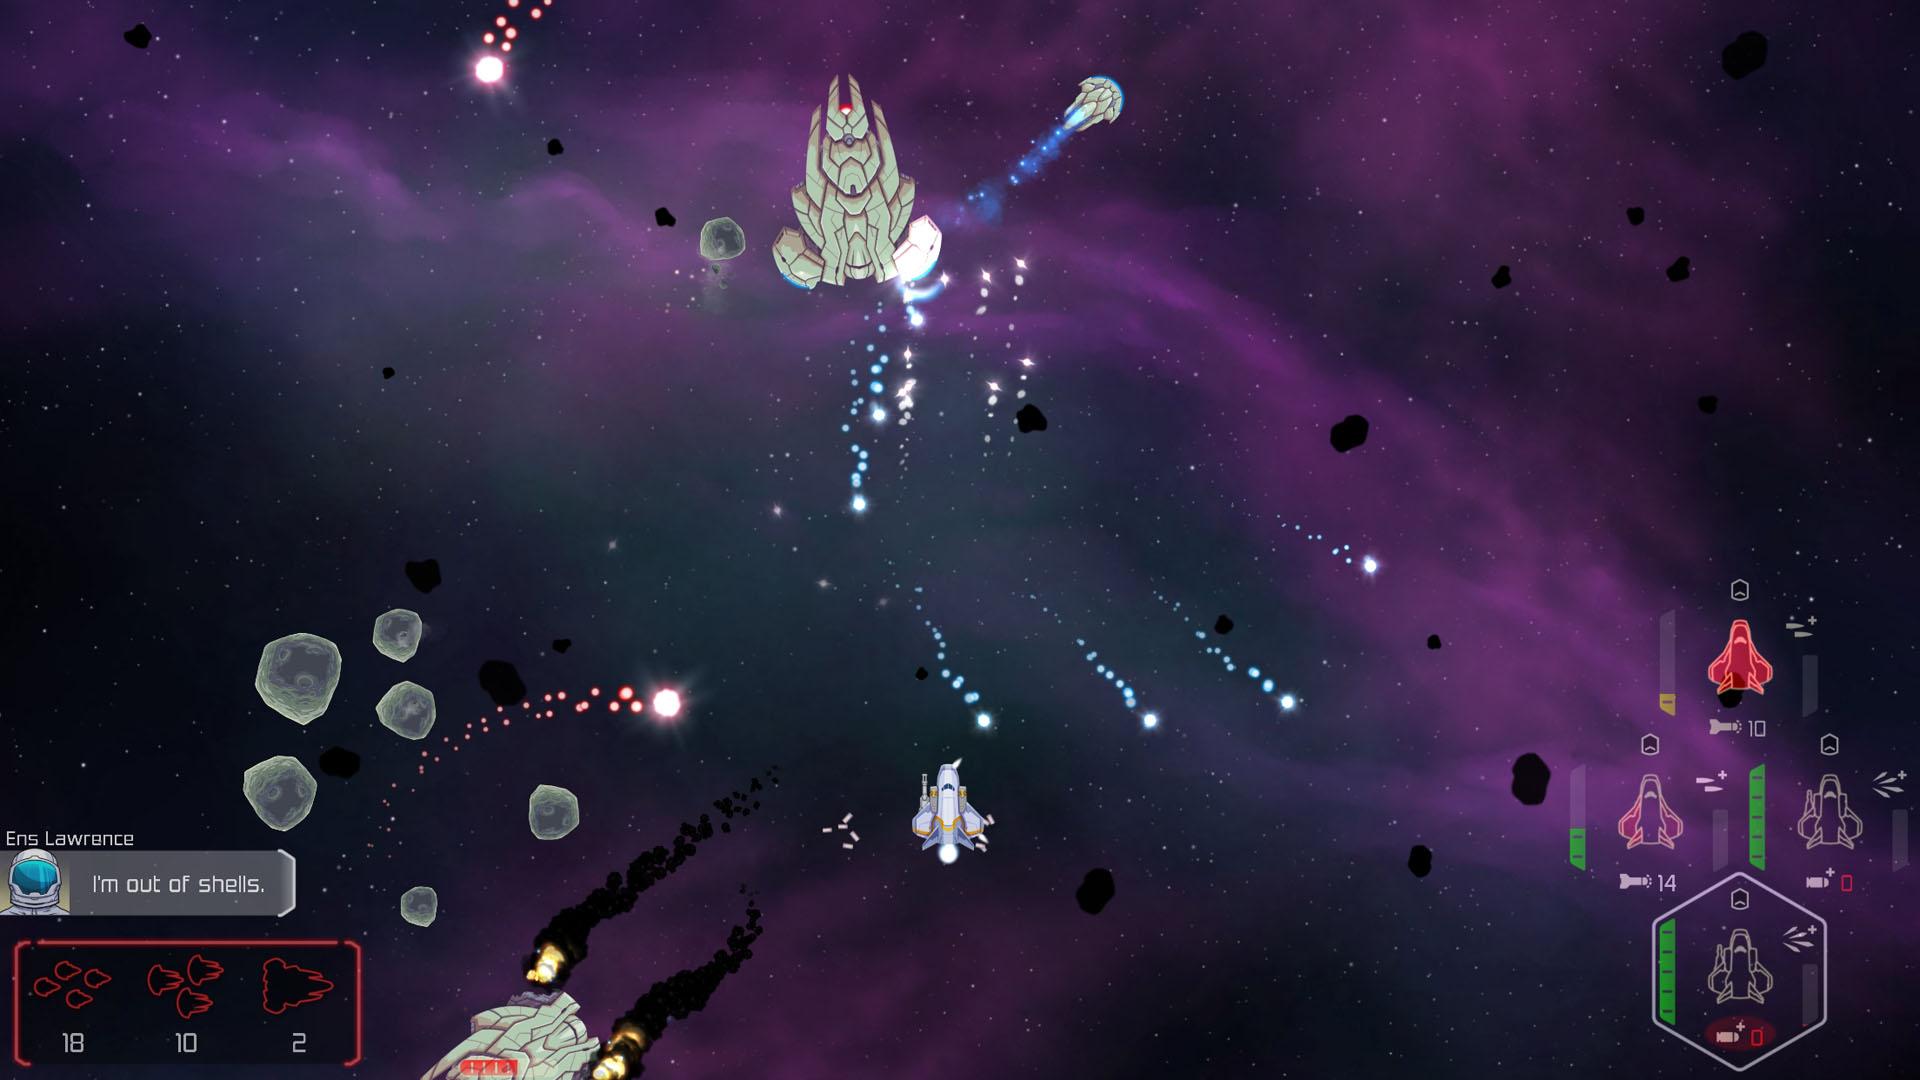 Screenshot 14 of 15